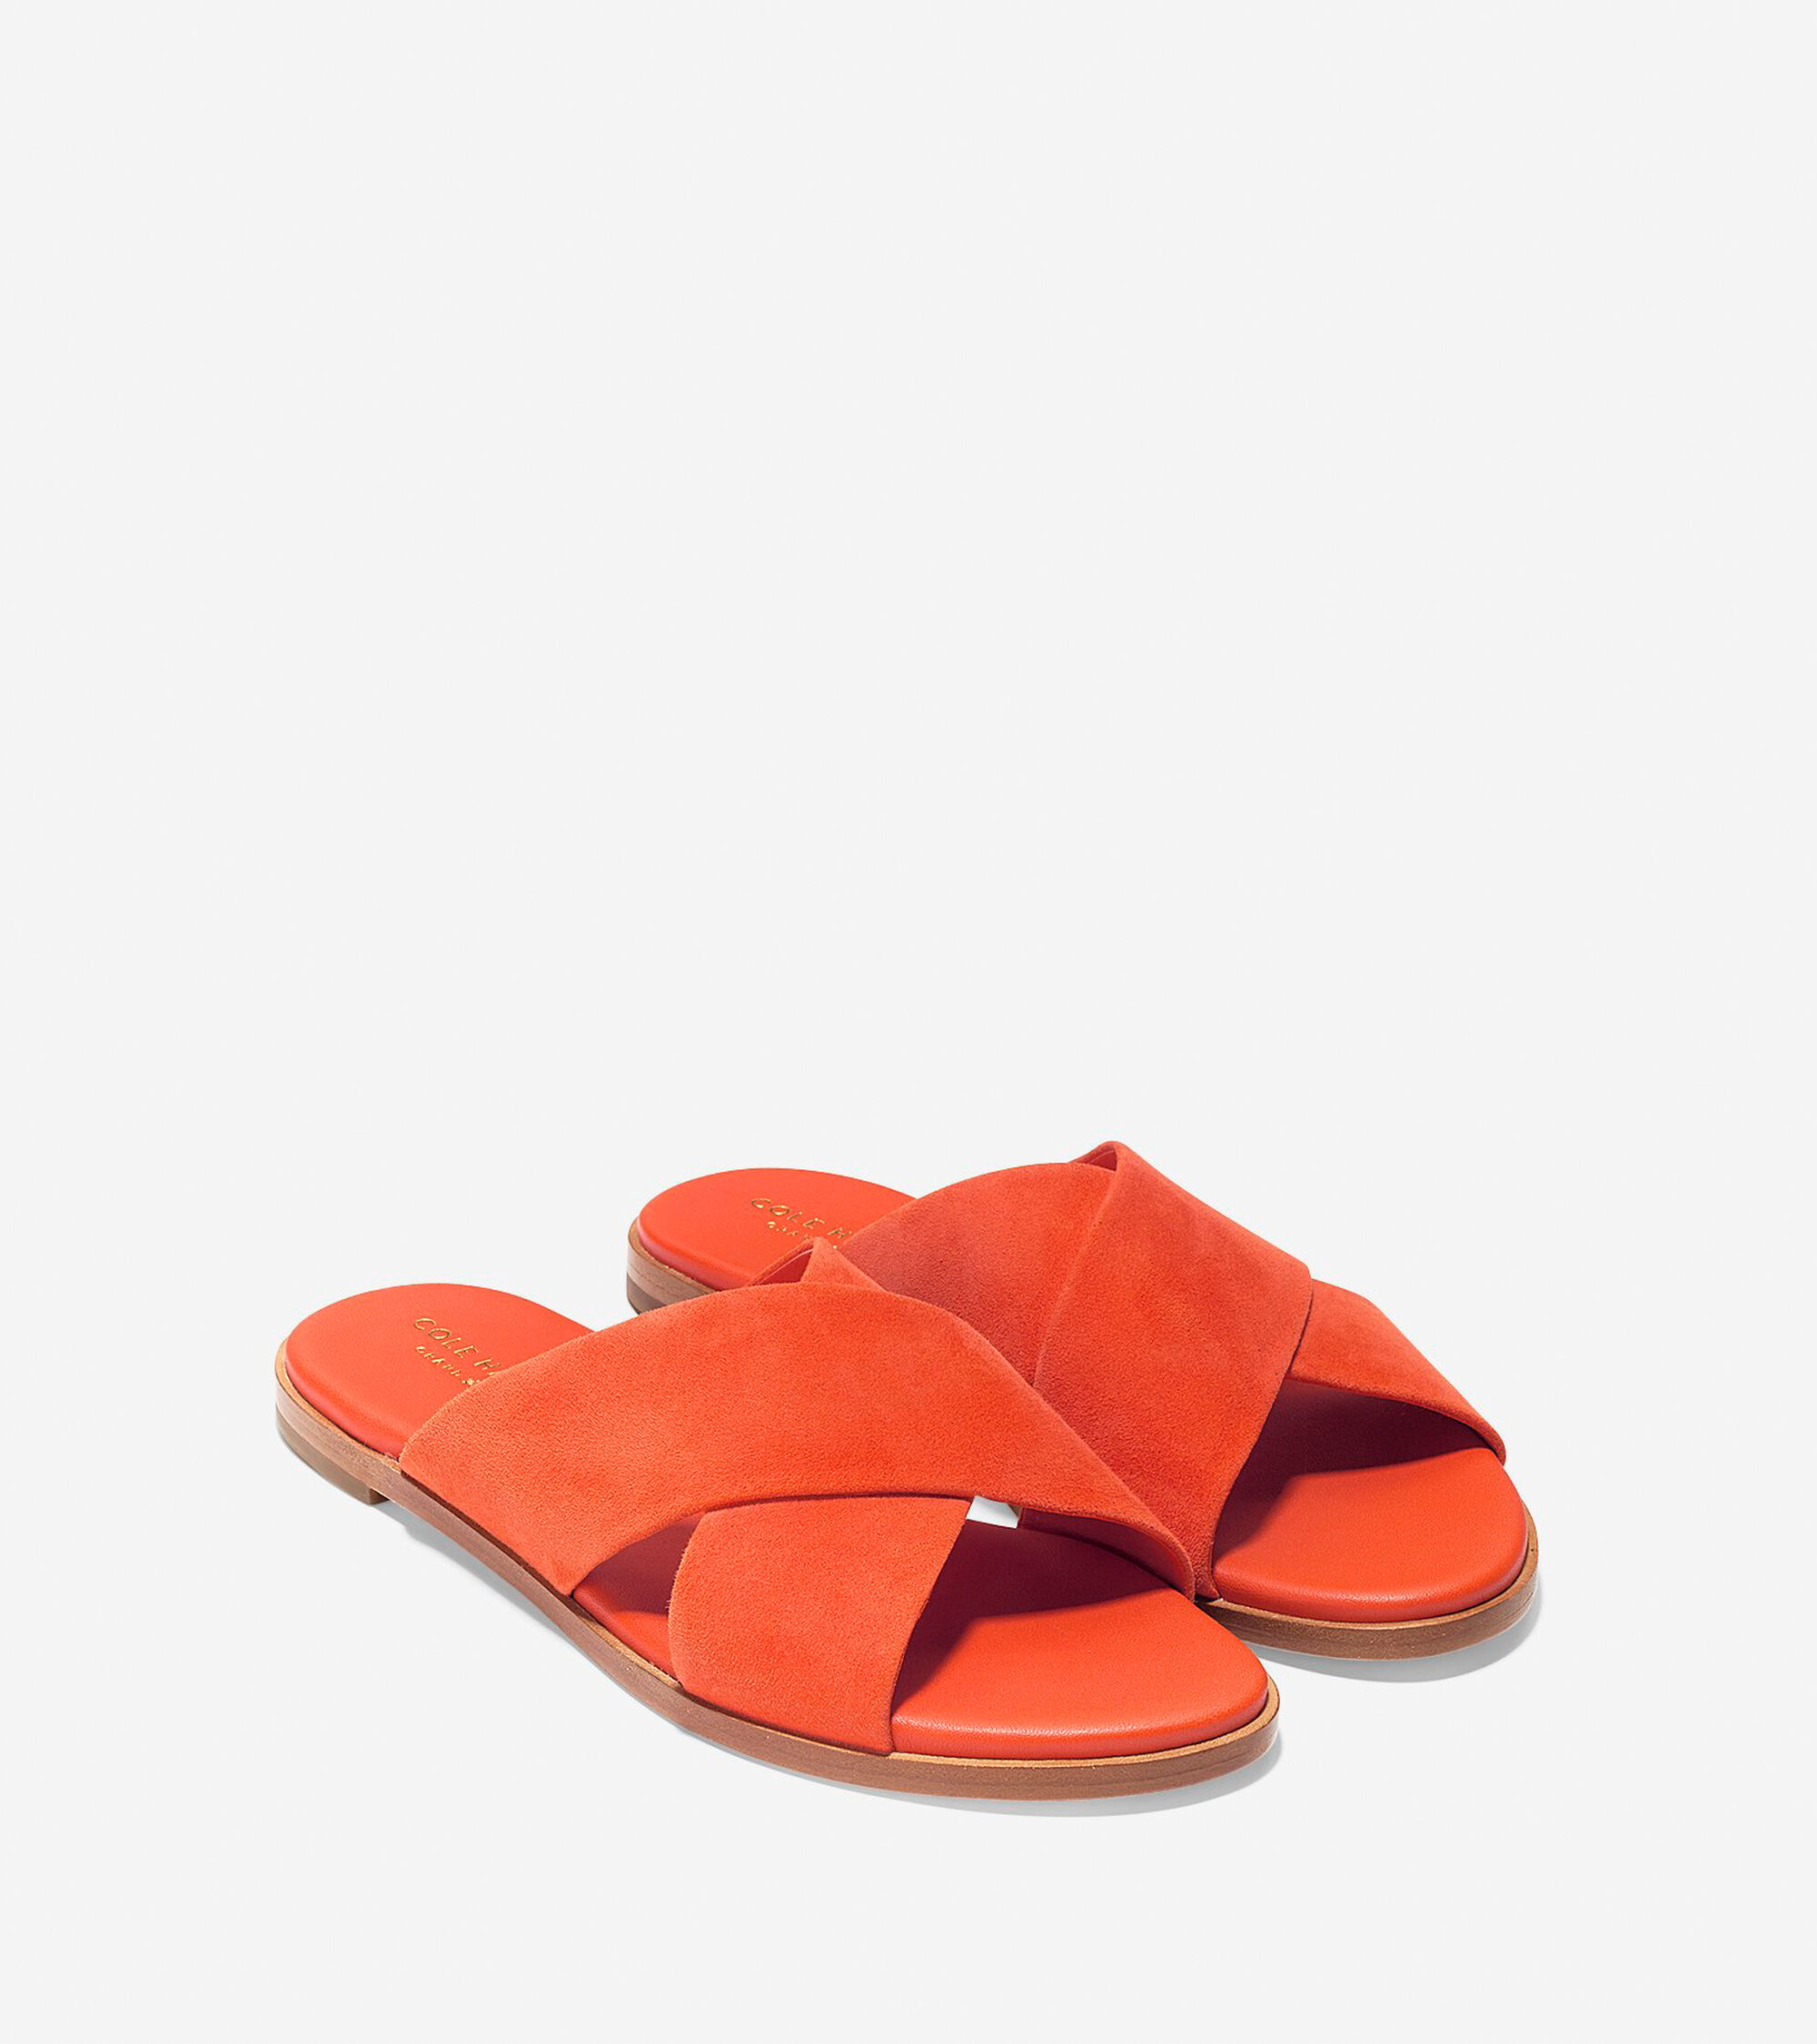 640c9d90c26 Anica Criss Cross Sandals in Spicy Orange Suede